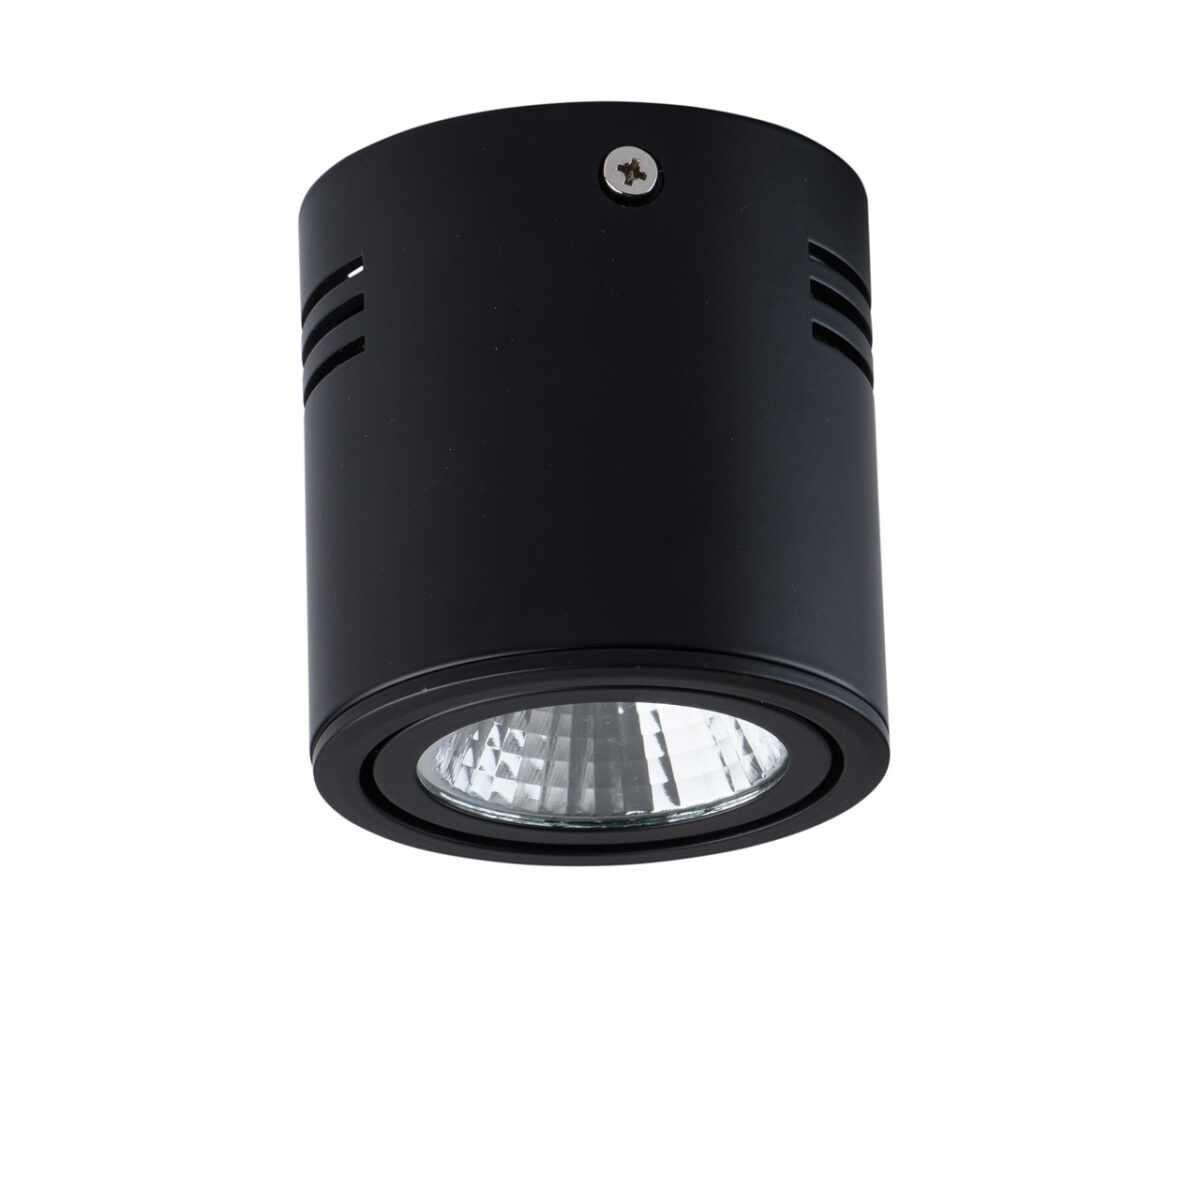 Spot MW-Light Techno 637014201 la pret 173 lei